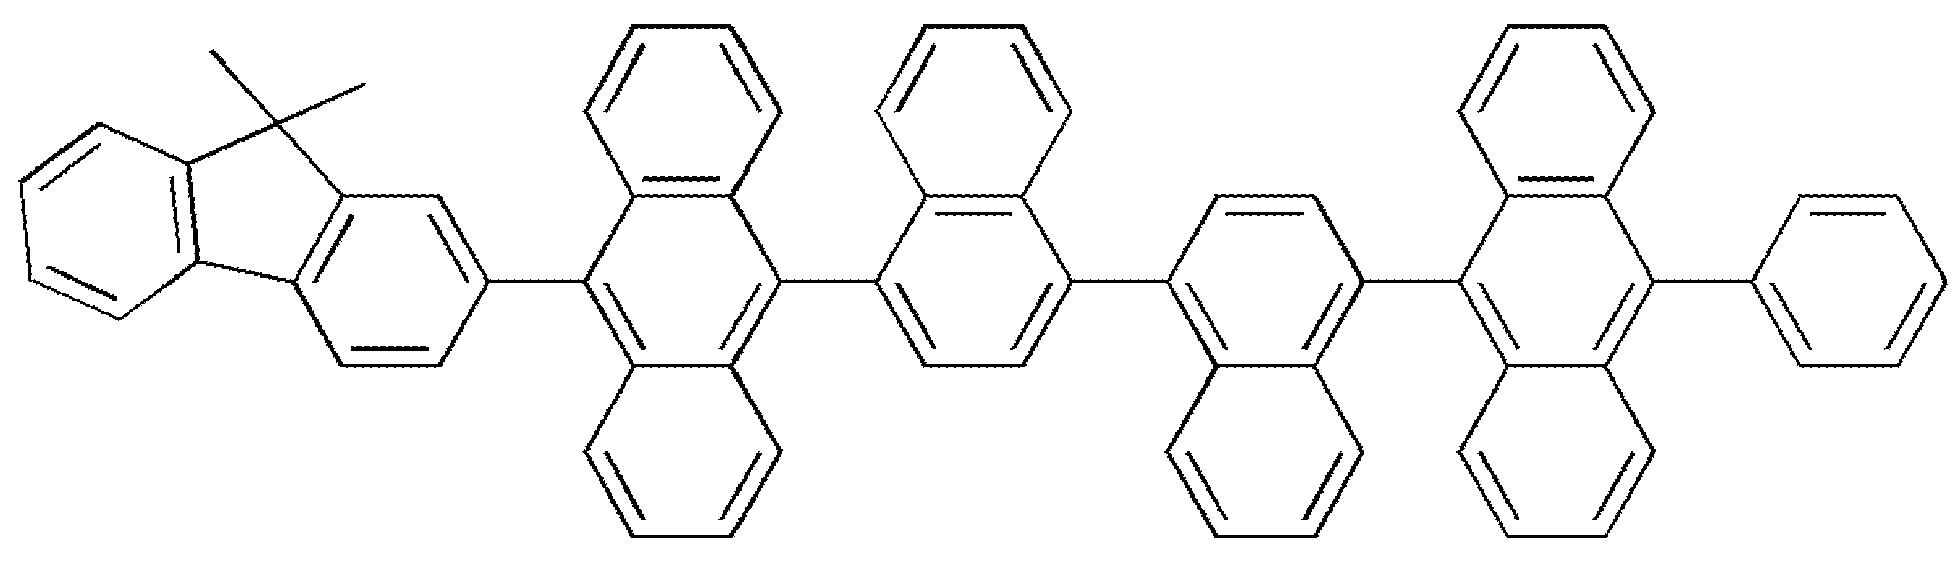 Figure 112007087103673-pat00656